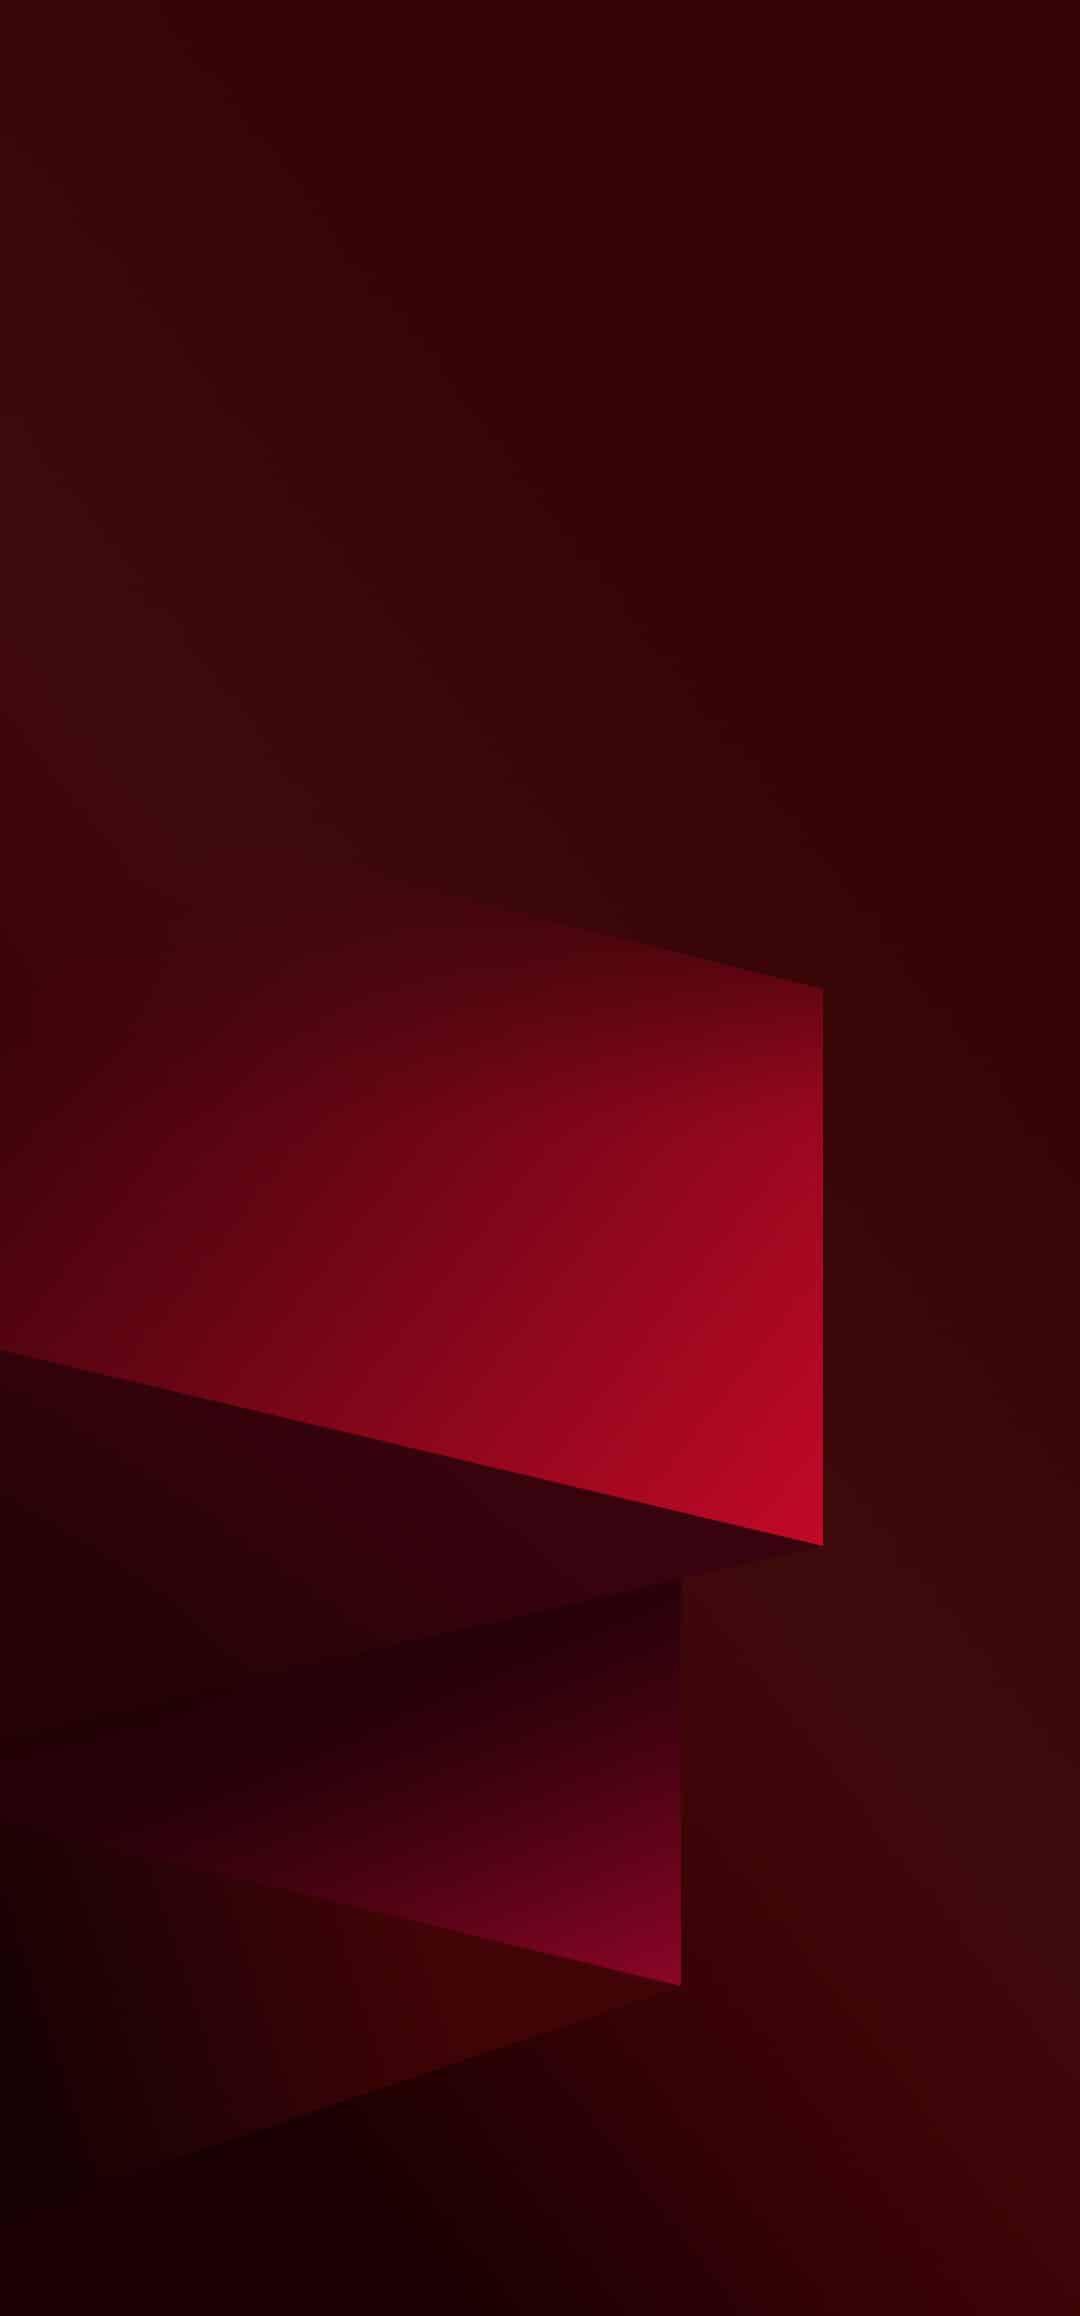 Vivo Nex Dual Display Wallpaper Ardroiding 01 Ar Droiding